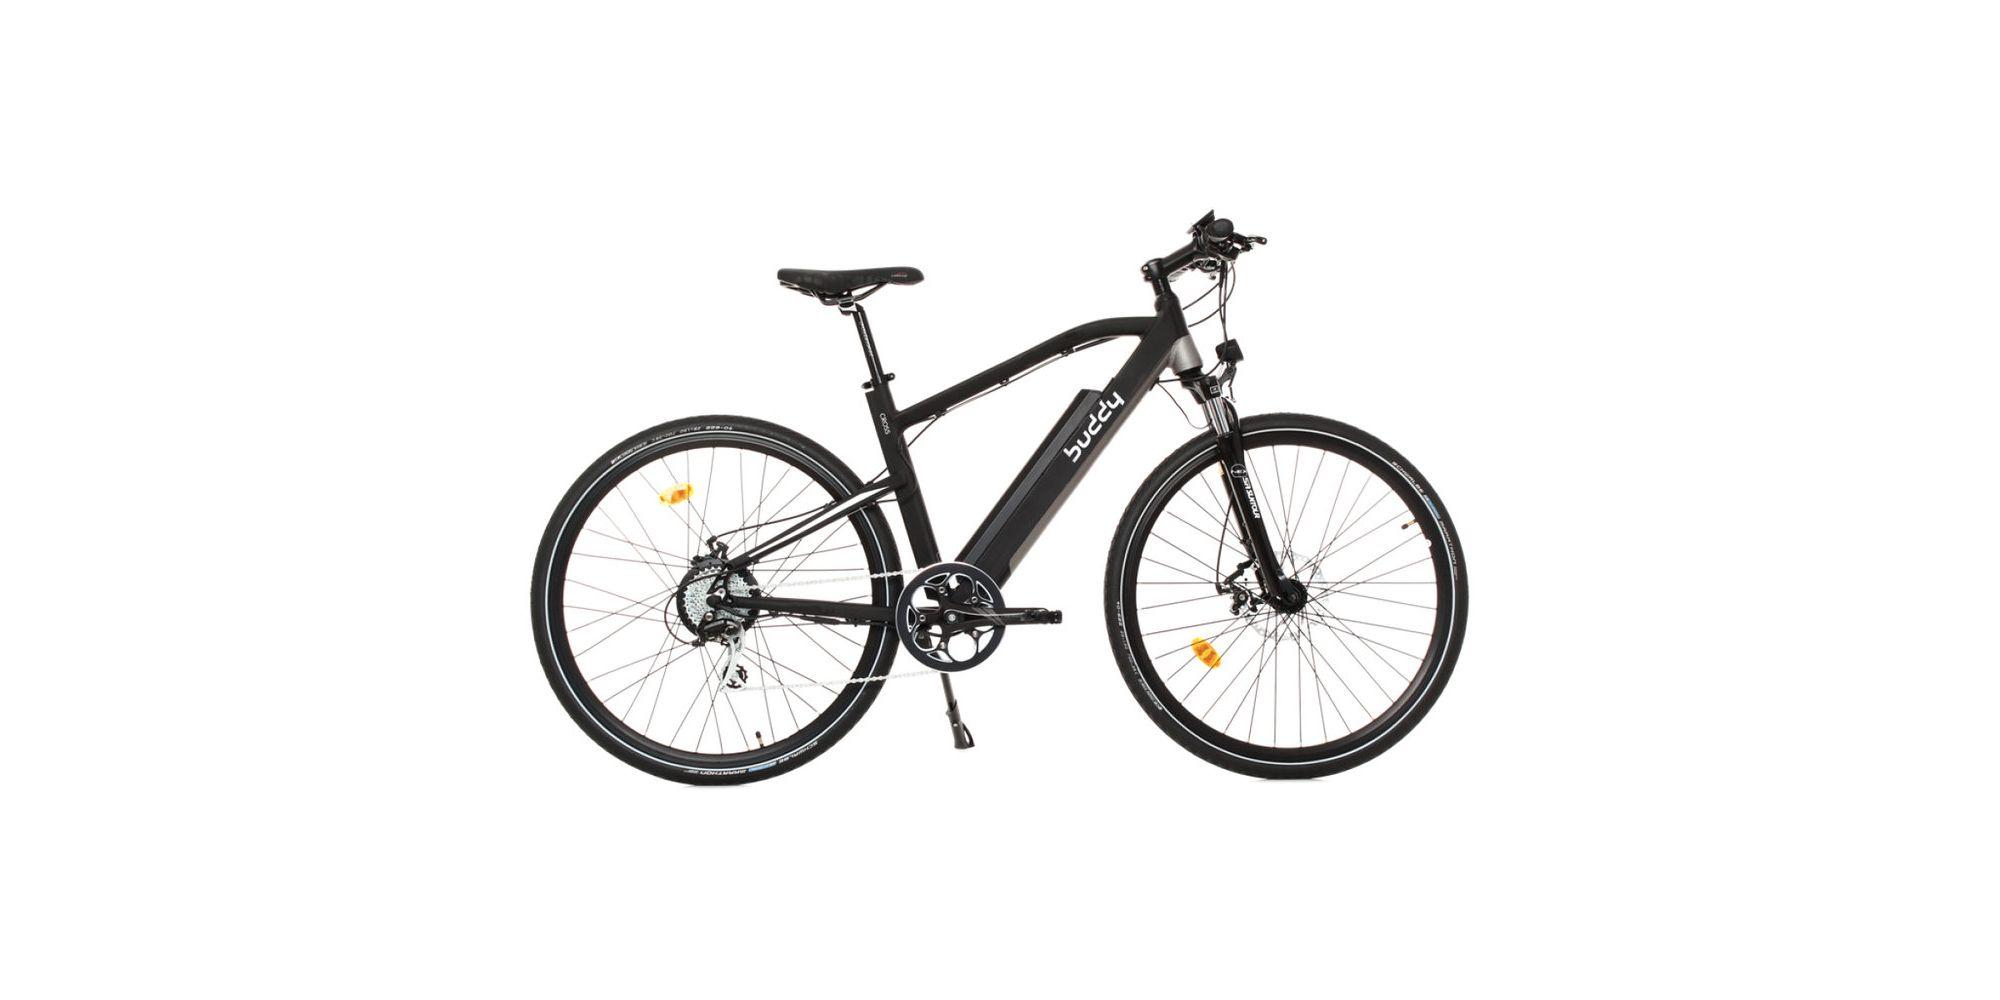 TEST: Buddy Bike Ui5 M elsykkel